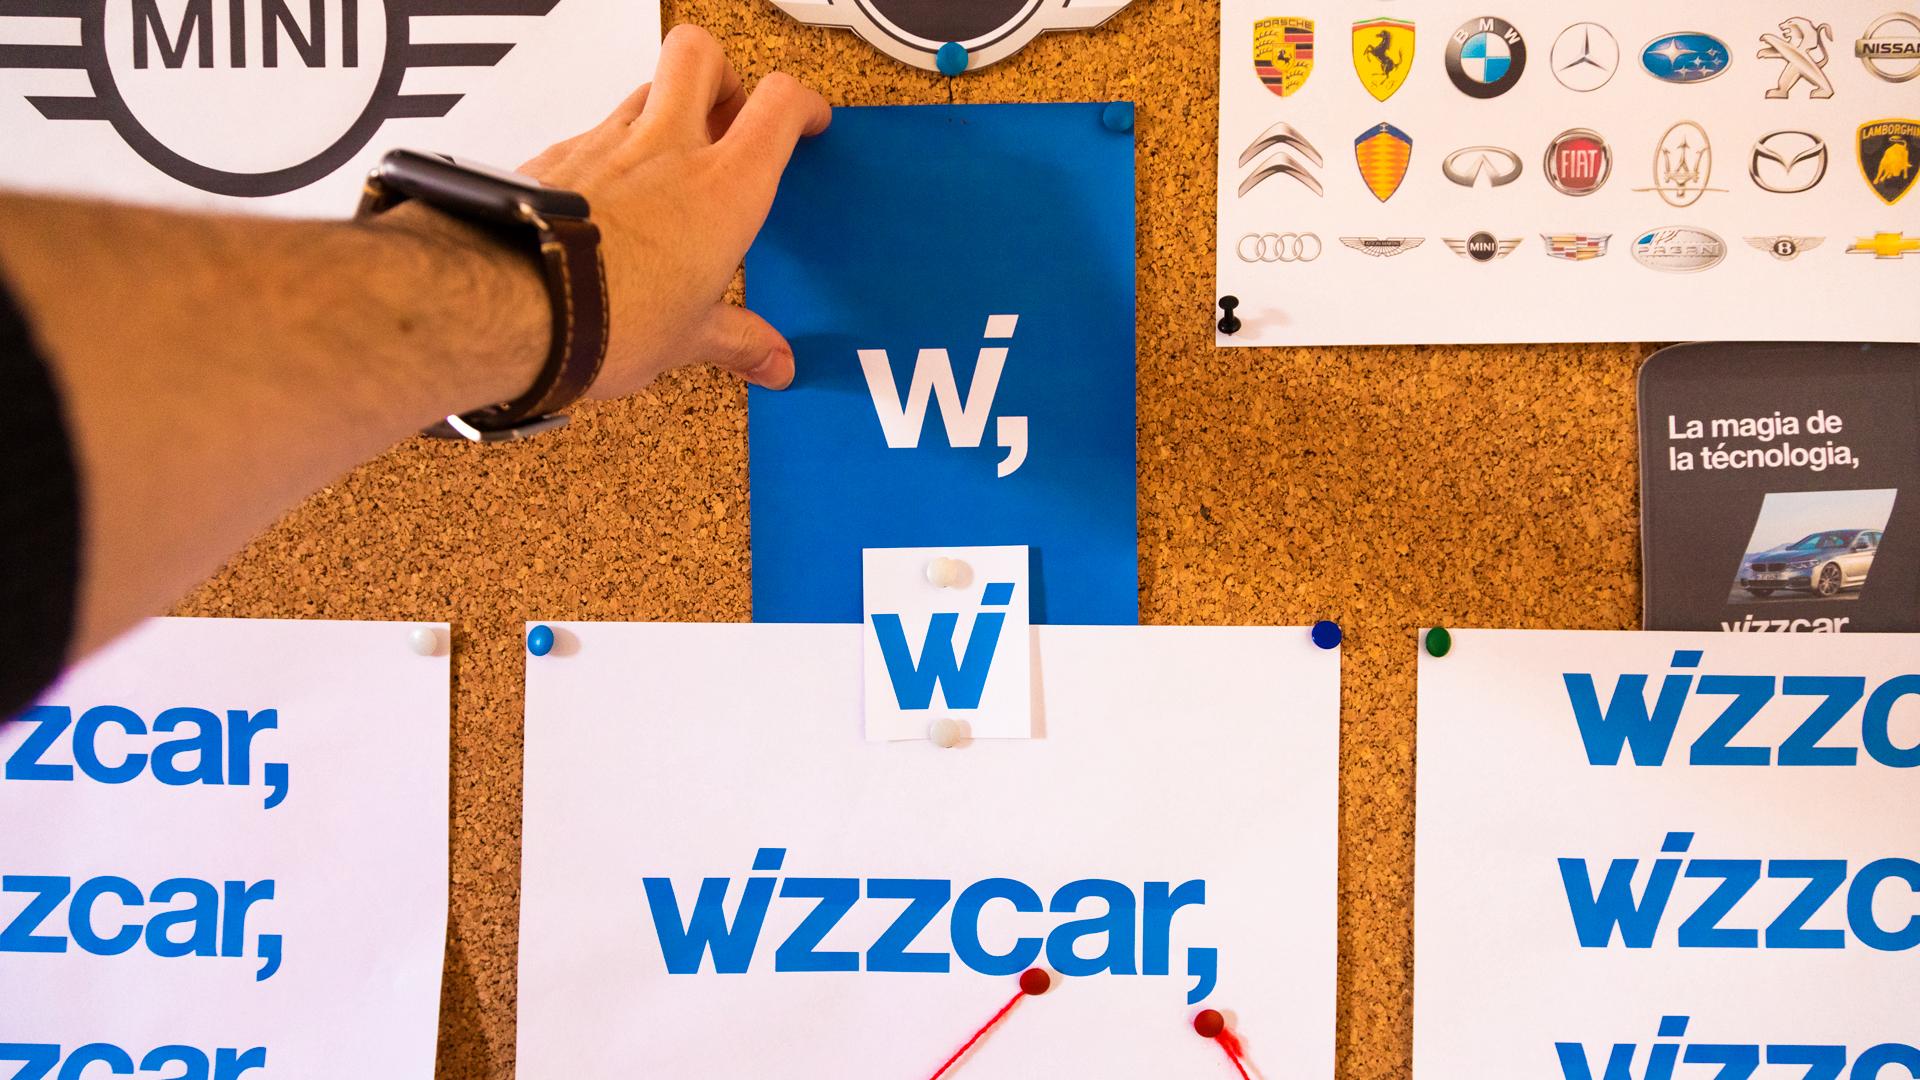 corcho-wizzcar